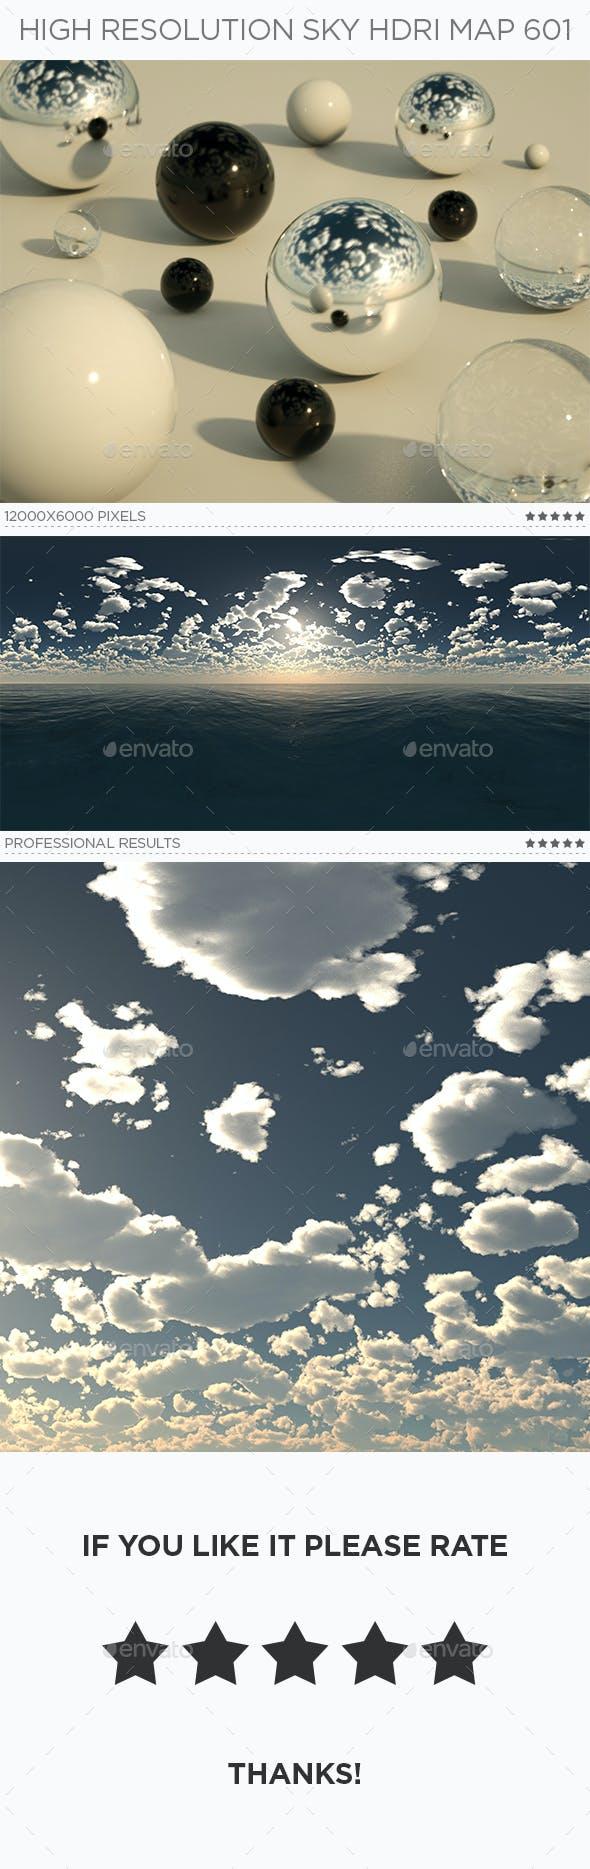 High Resolution Sky HDRi Map 601 - 3DOcean Item for Sale